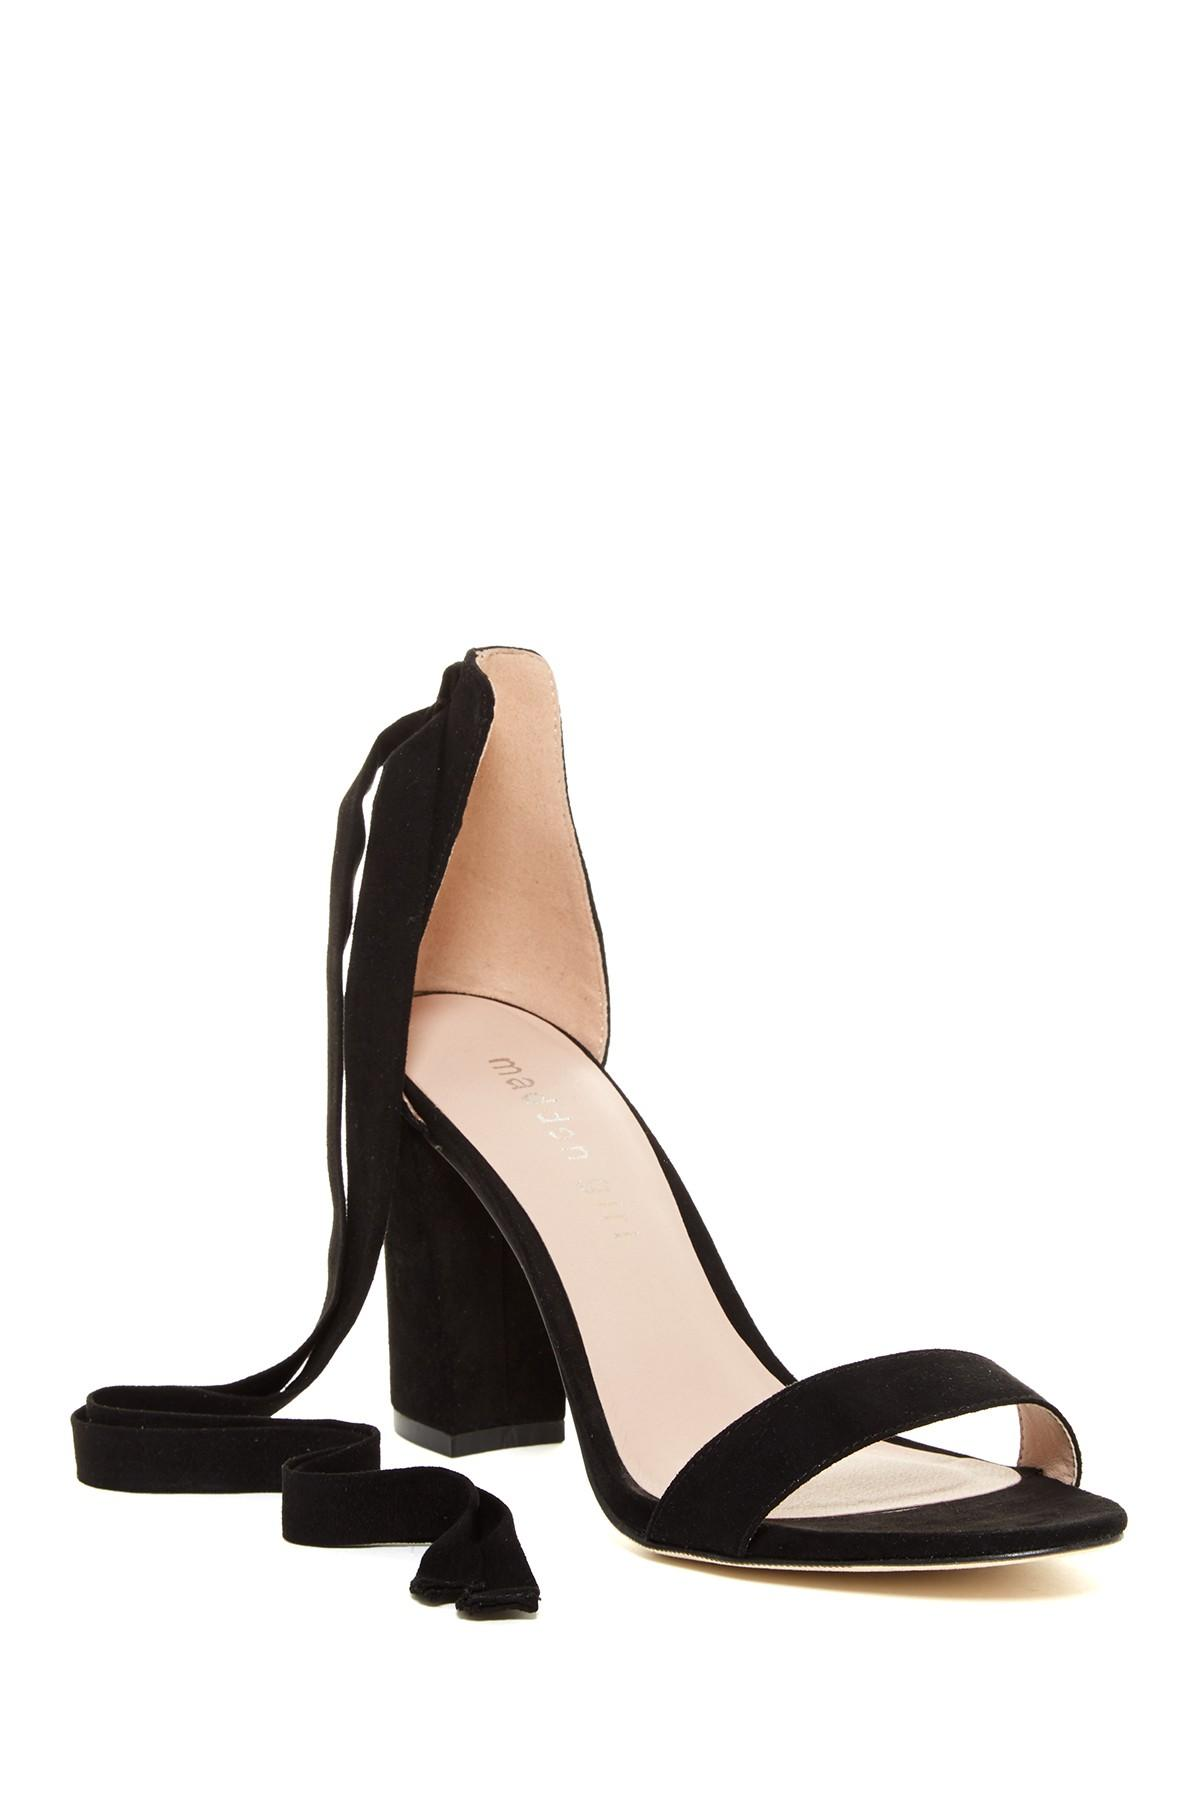 bc54c36d0ed Lyst - Madden Girl Bonniie Ankle Tie Sandal in Black